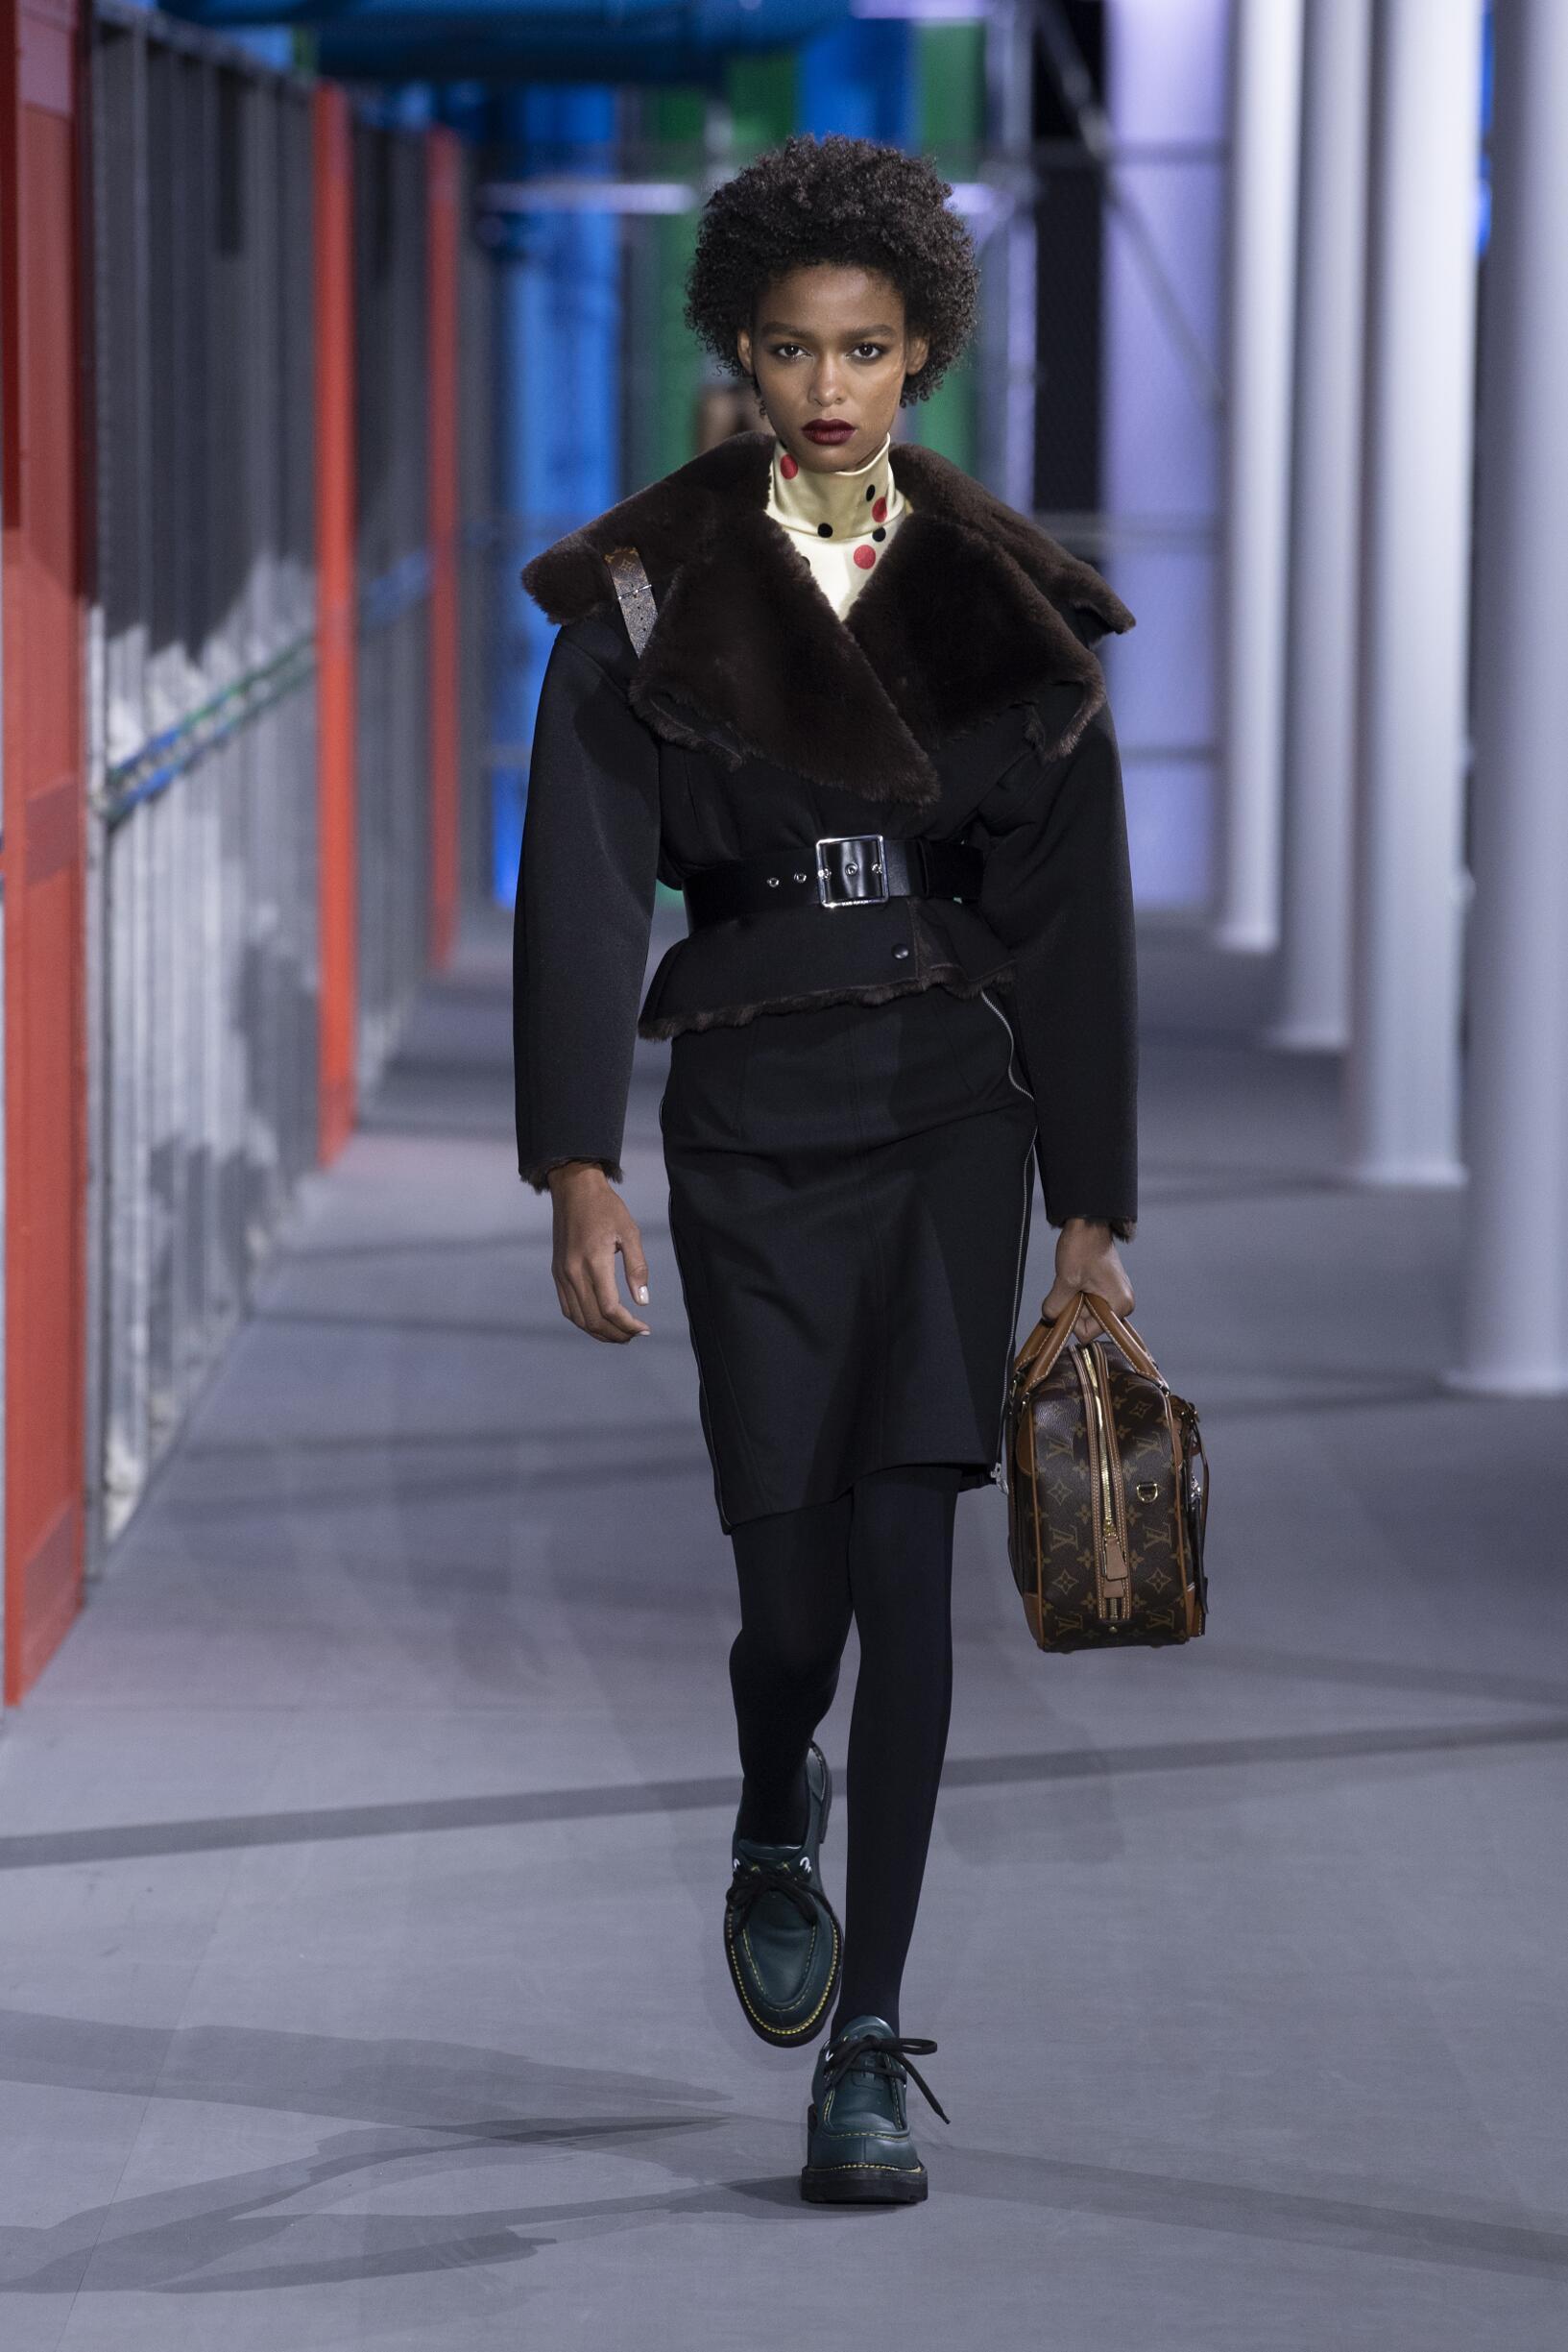 Woman FW 2019 Louis Vuitton Show Paris Fashion Week